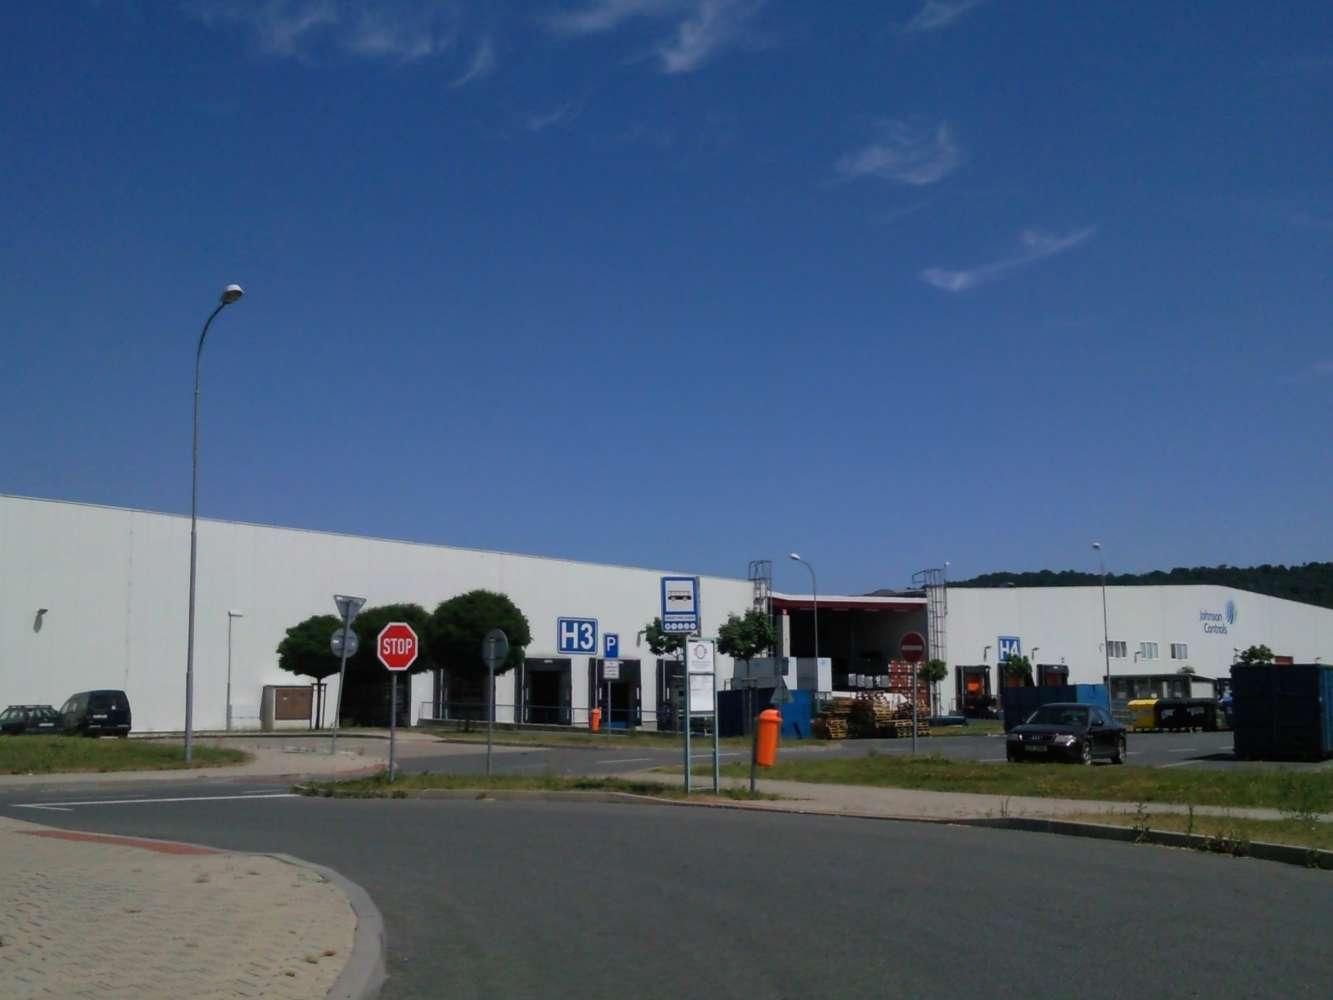 Průmyslové nemovitosti Mlada boleslav - bezdecin,  - UNO Park Mladá Boleslav - Bezděčín - 231390493671400